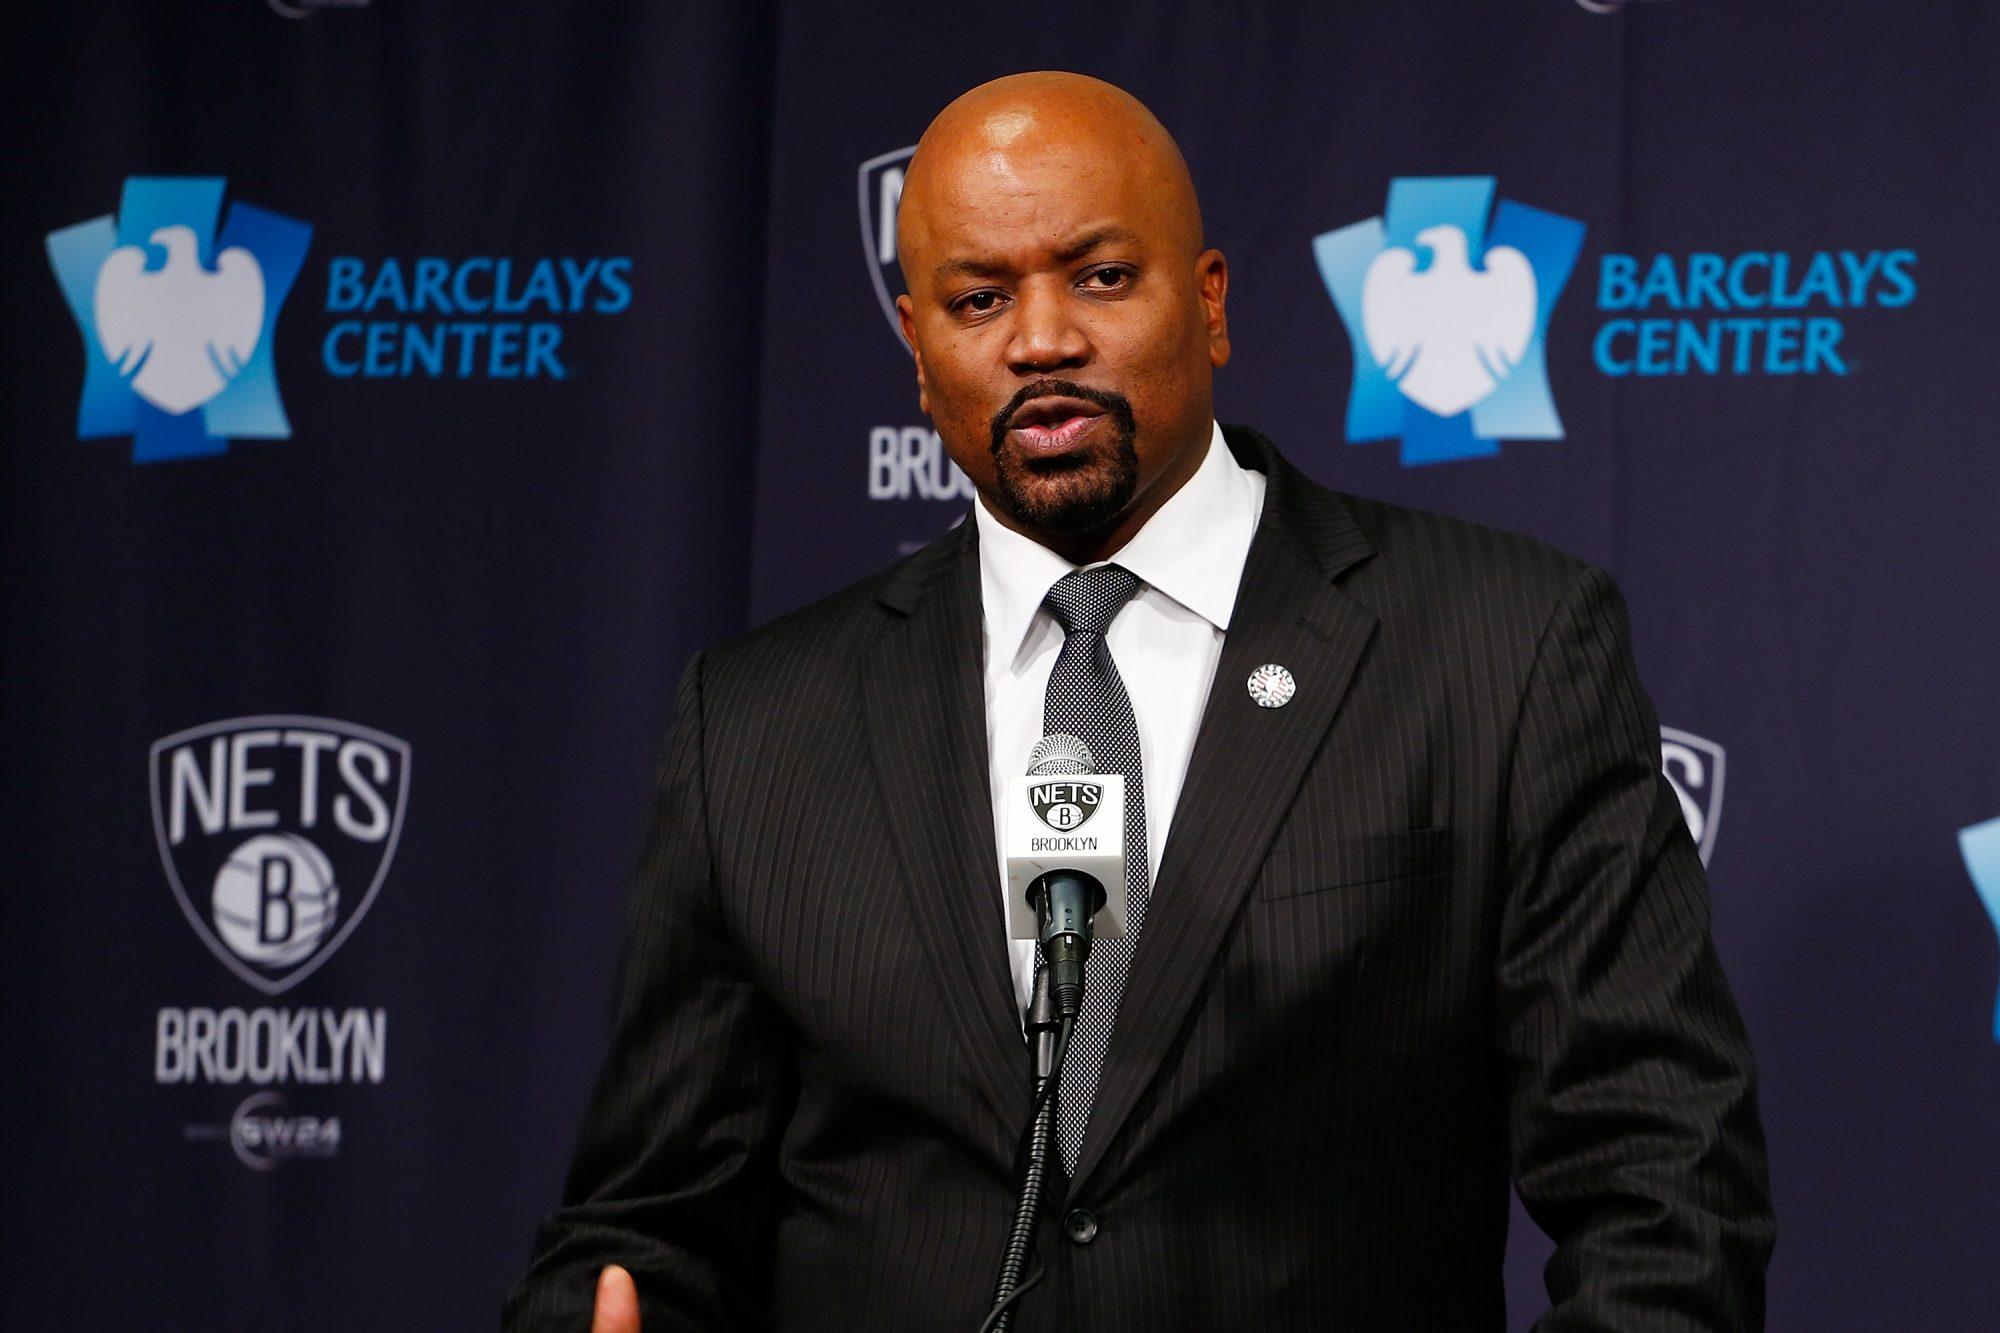 Brooklyn Nets News Beat 9/21/17: BPI Rankings, Billy King Talks Celtics Deal